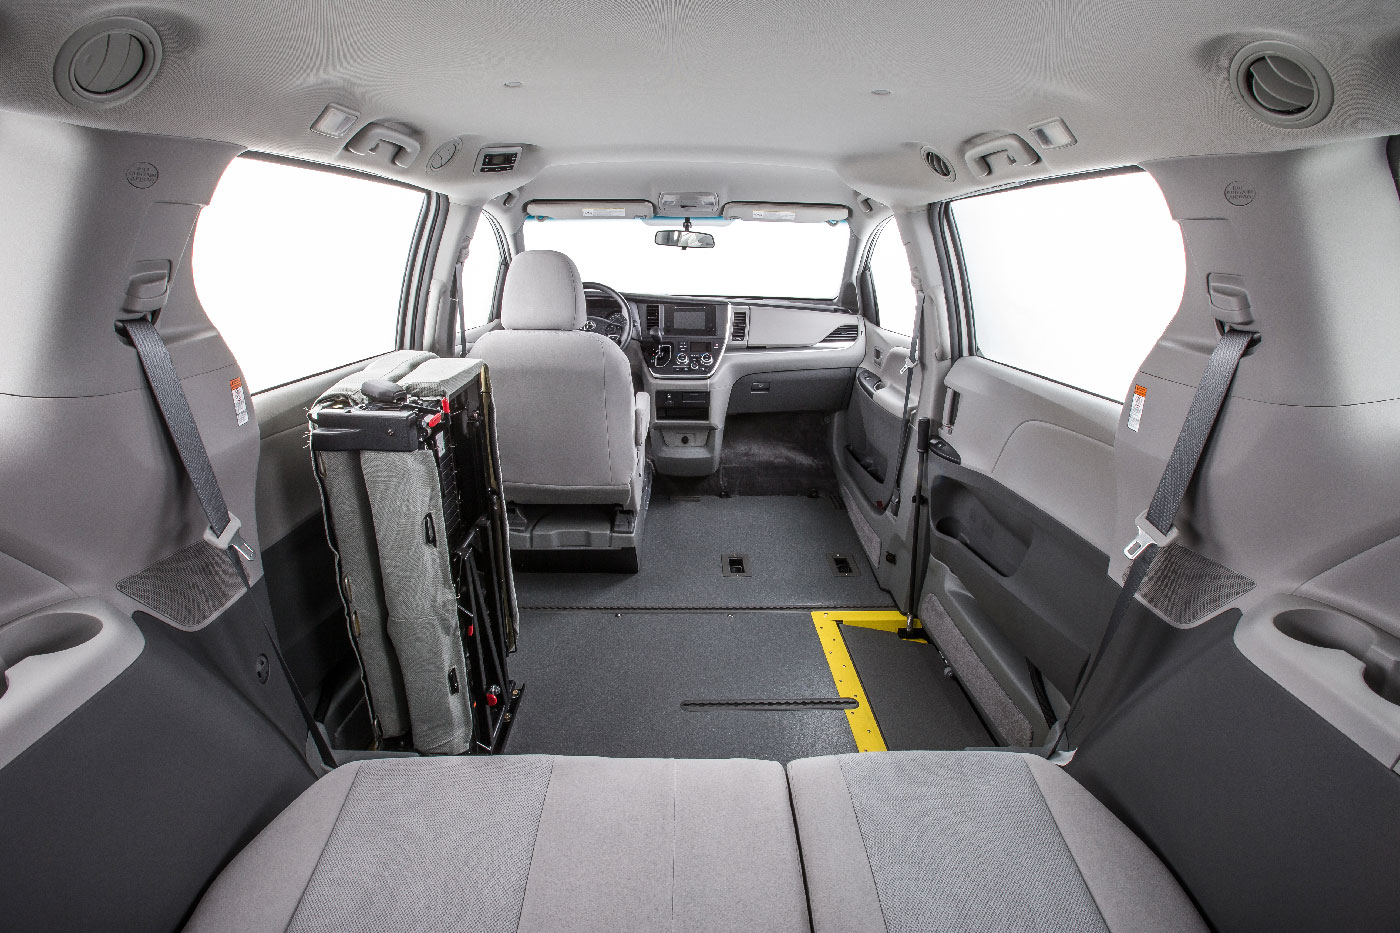 Toyota Sienna Commercial Ada Compliant Northstar E360 Minivan